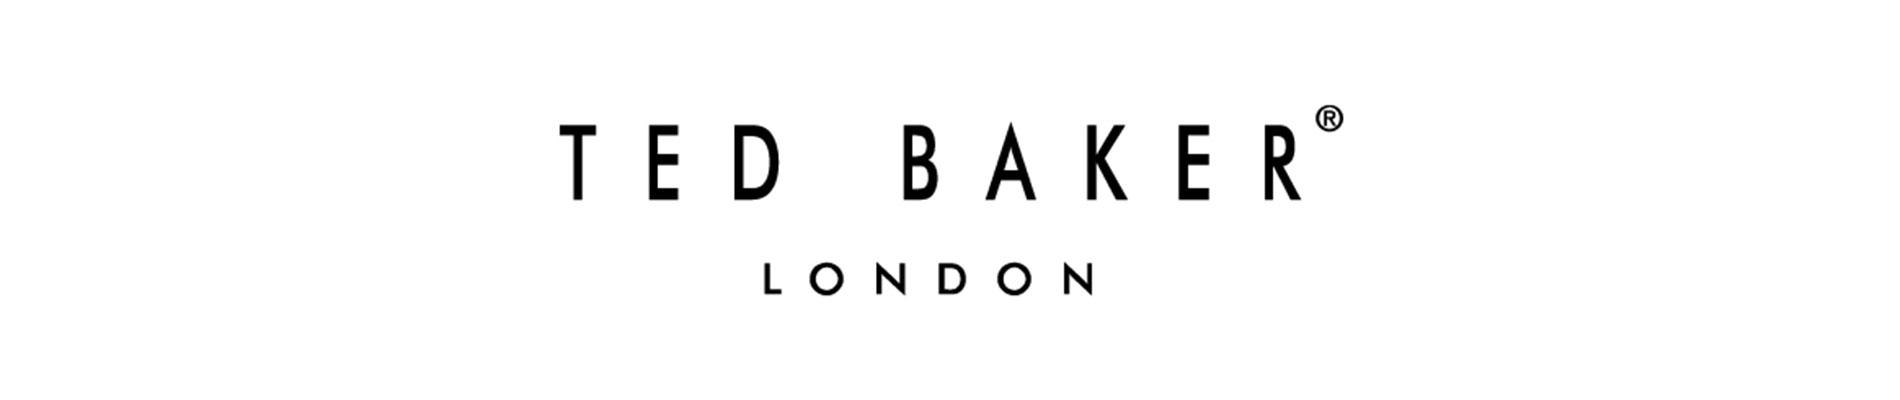 ted baker london eyewear designer frame logo